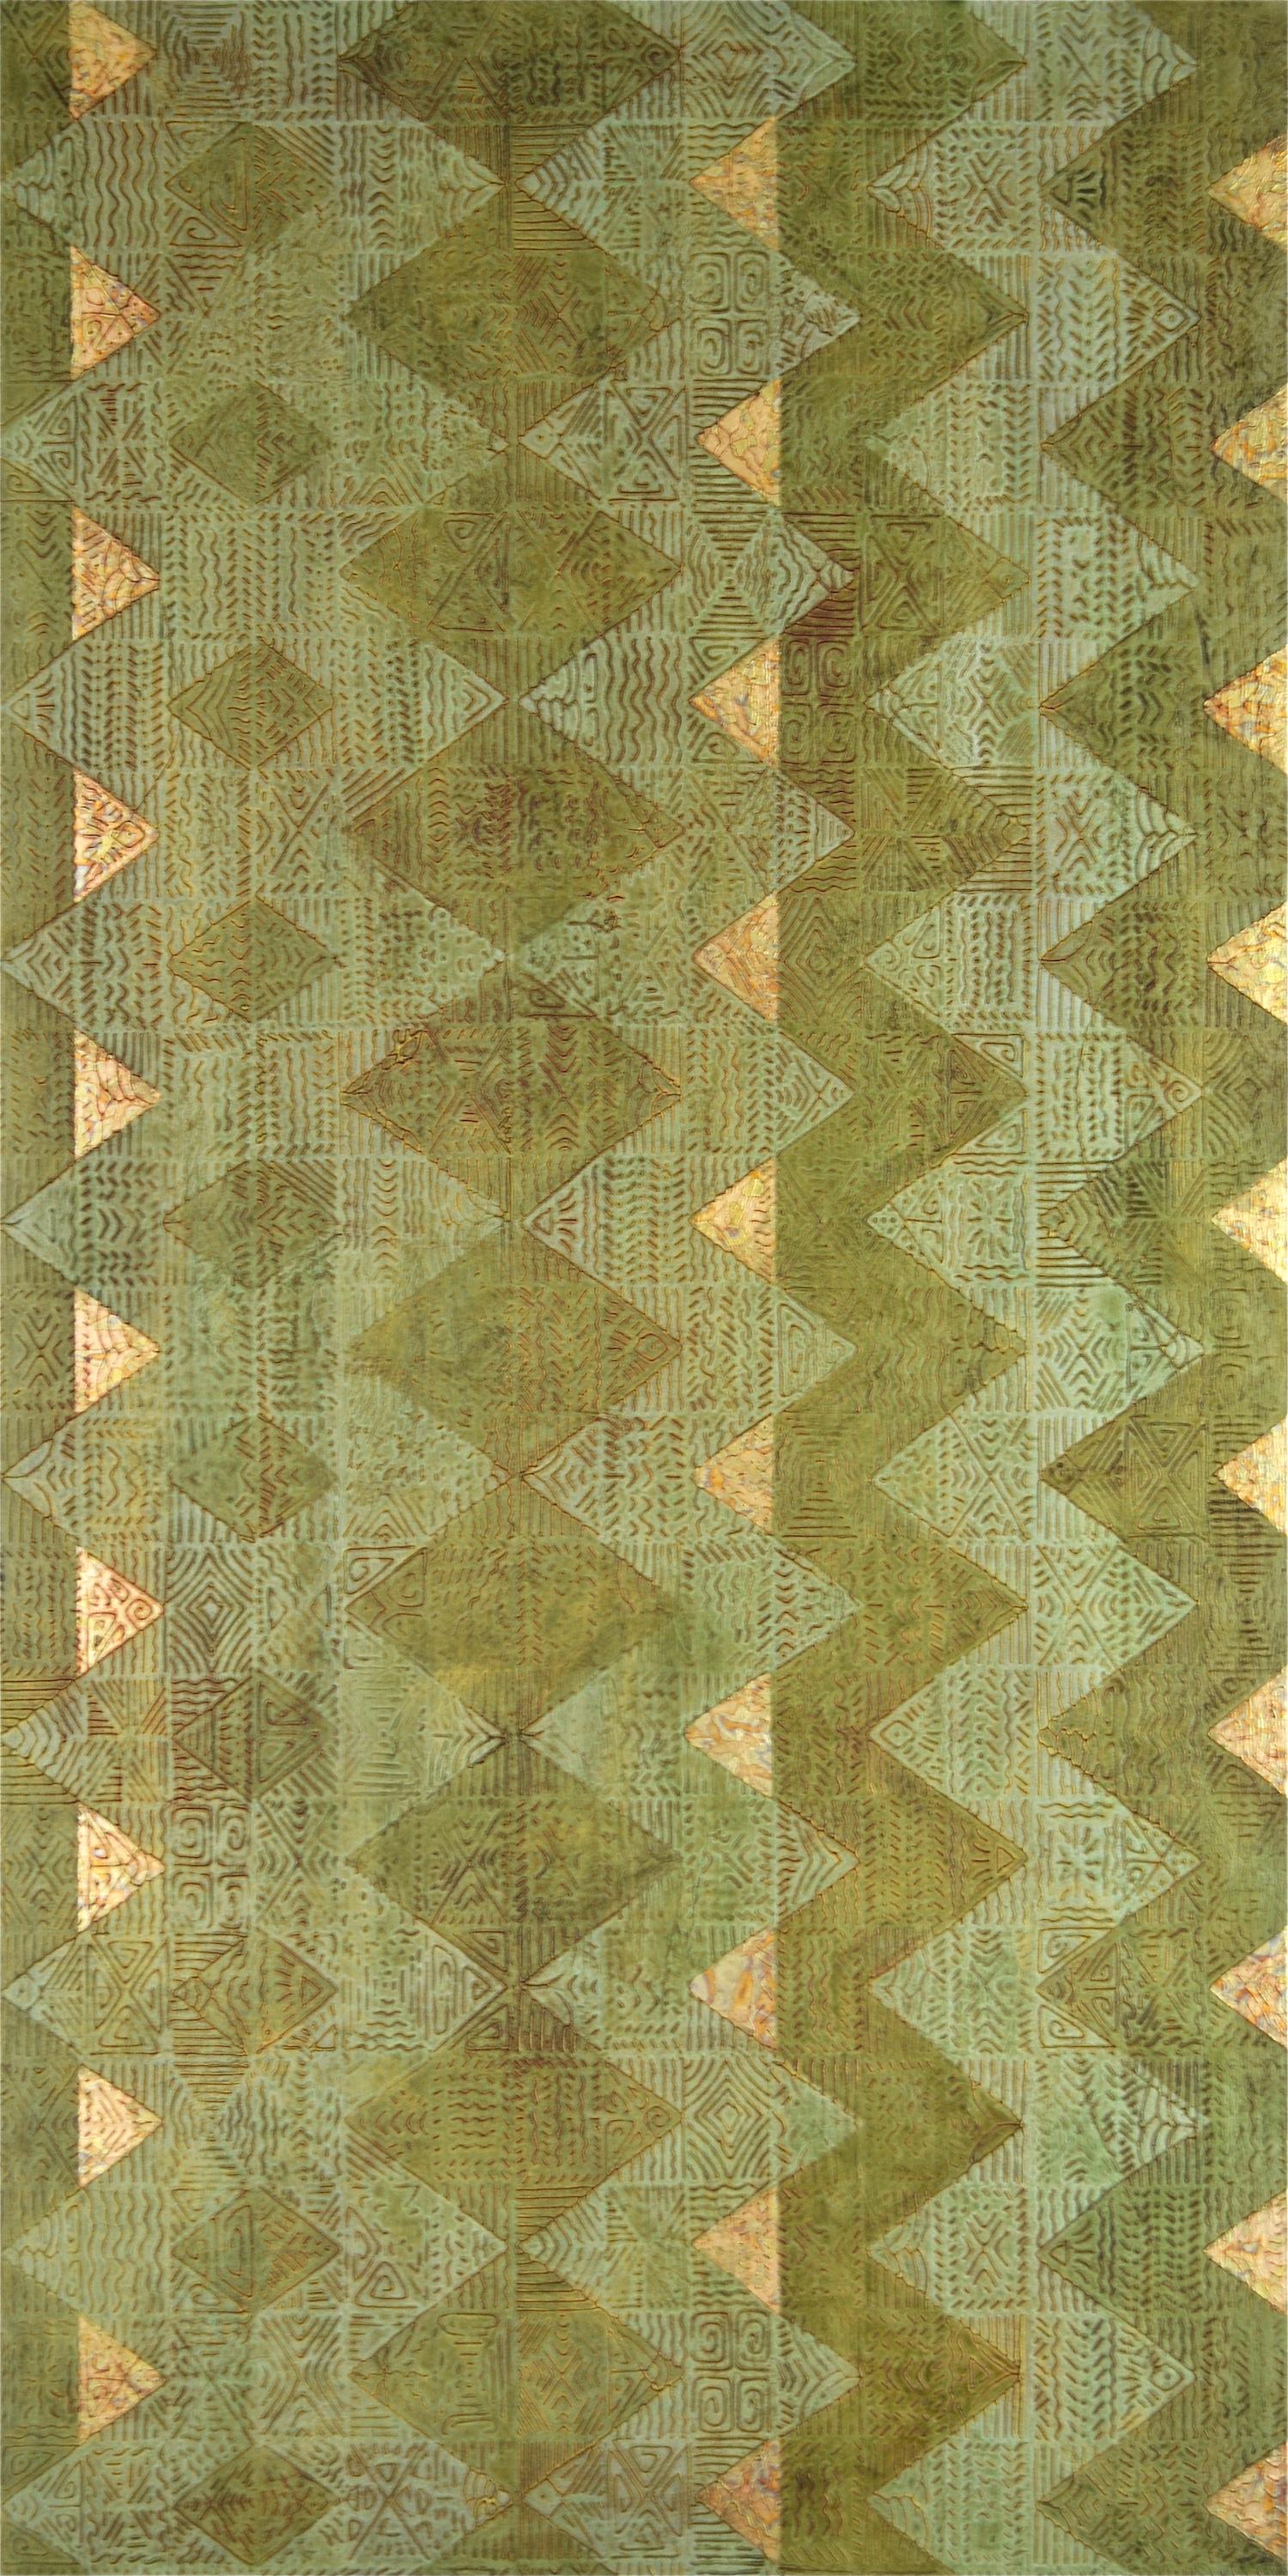 "Moss 30"" W x 60"" H x 2"" D Acrylic, oil & gold leaf on archival board"